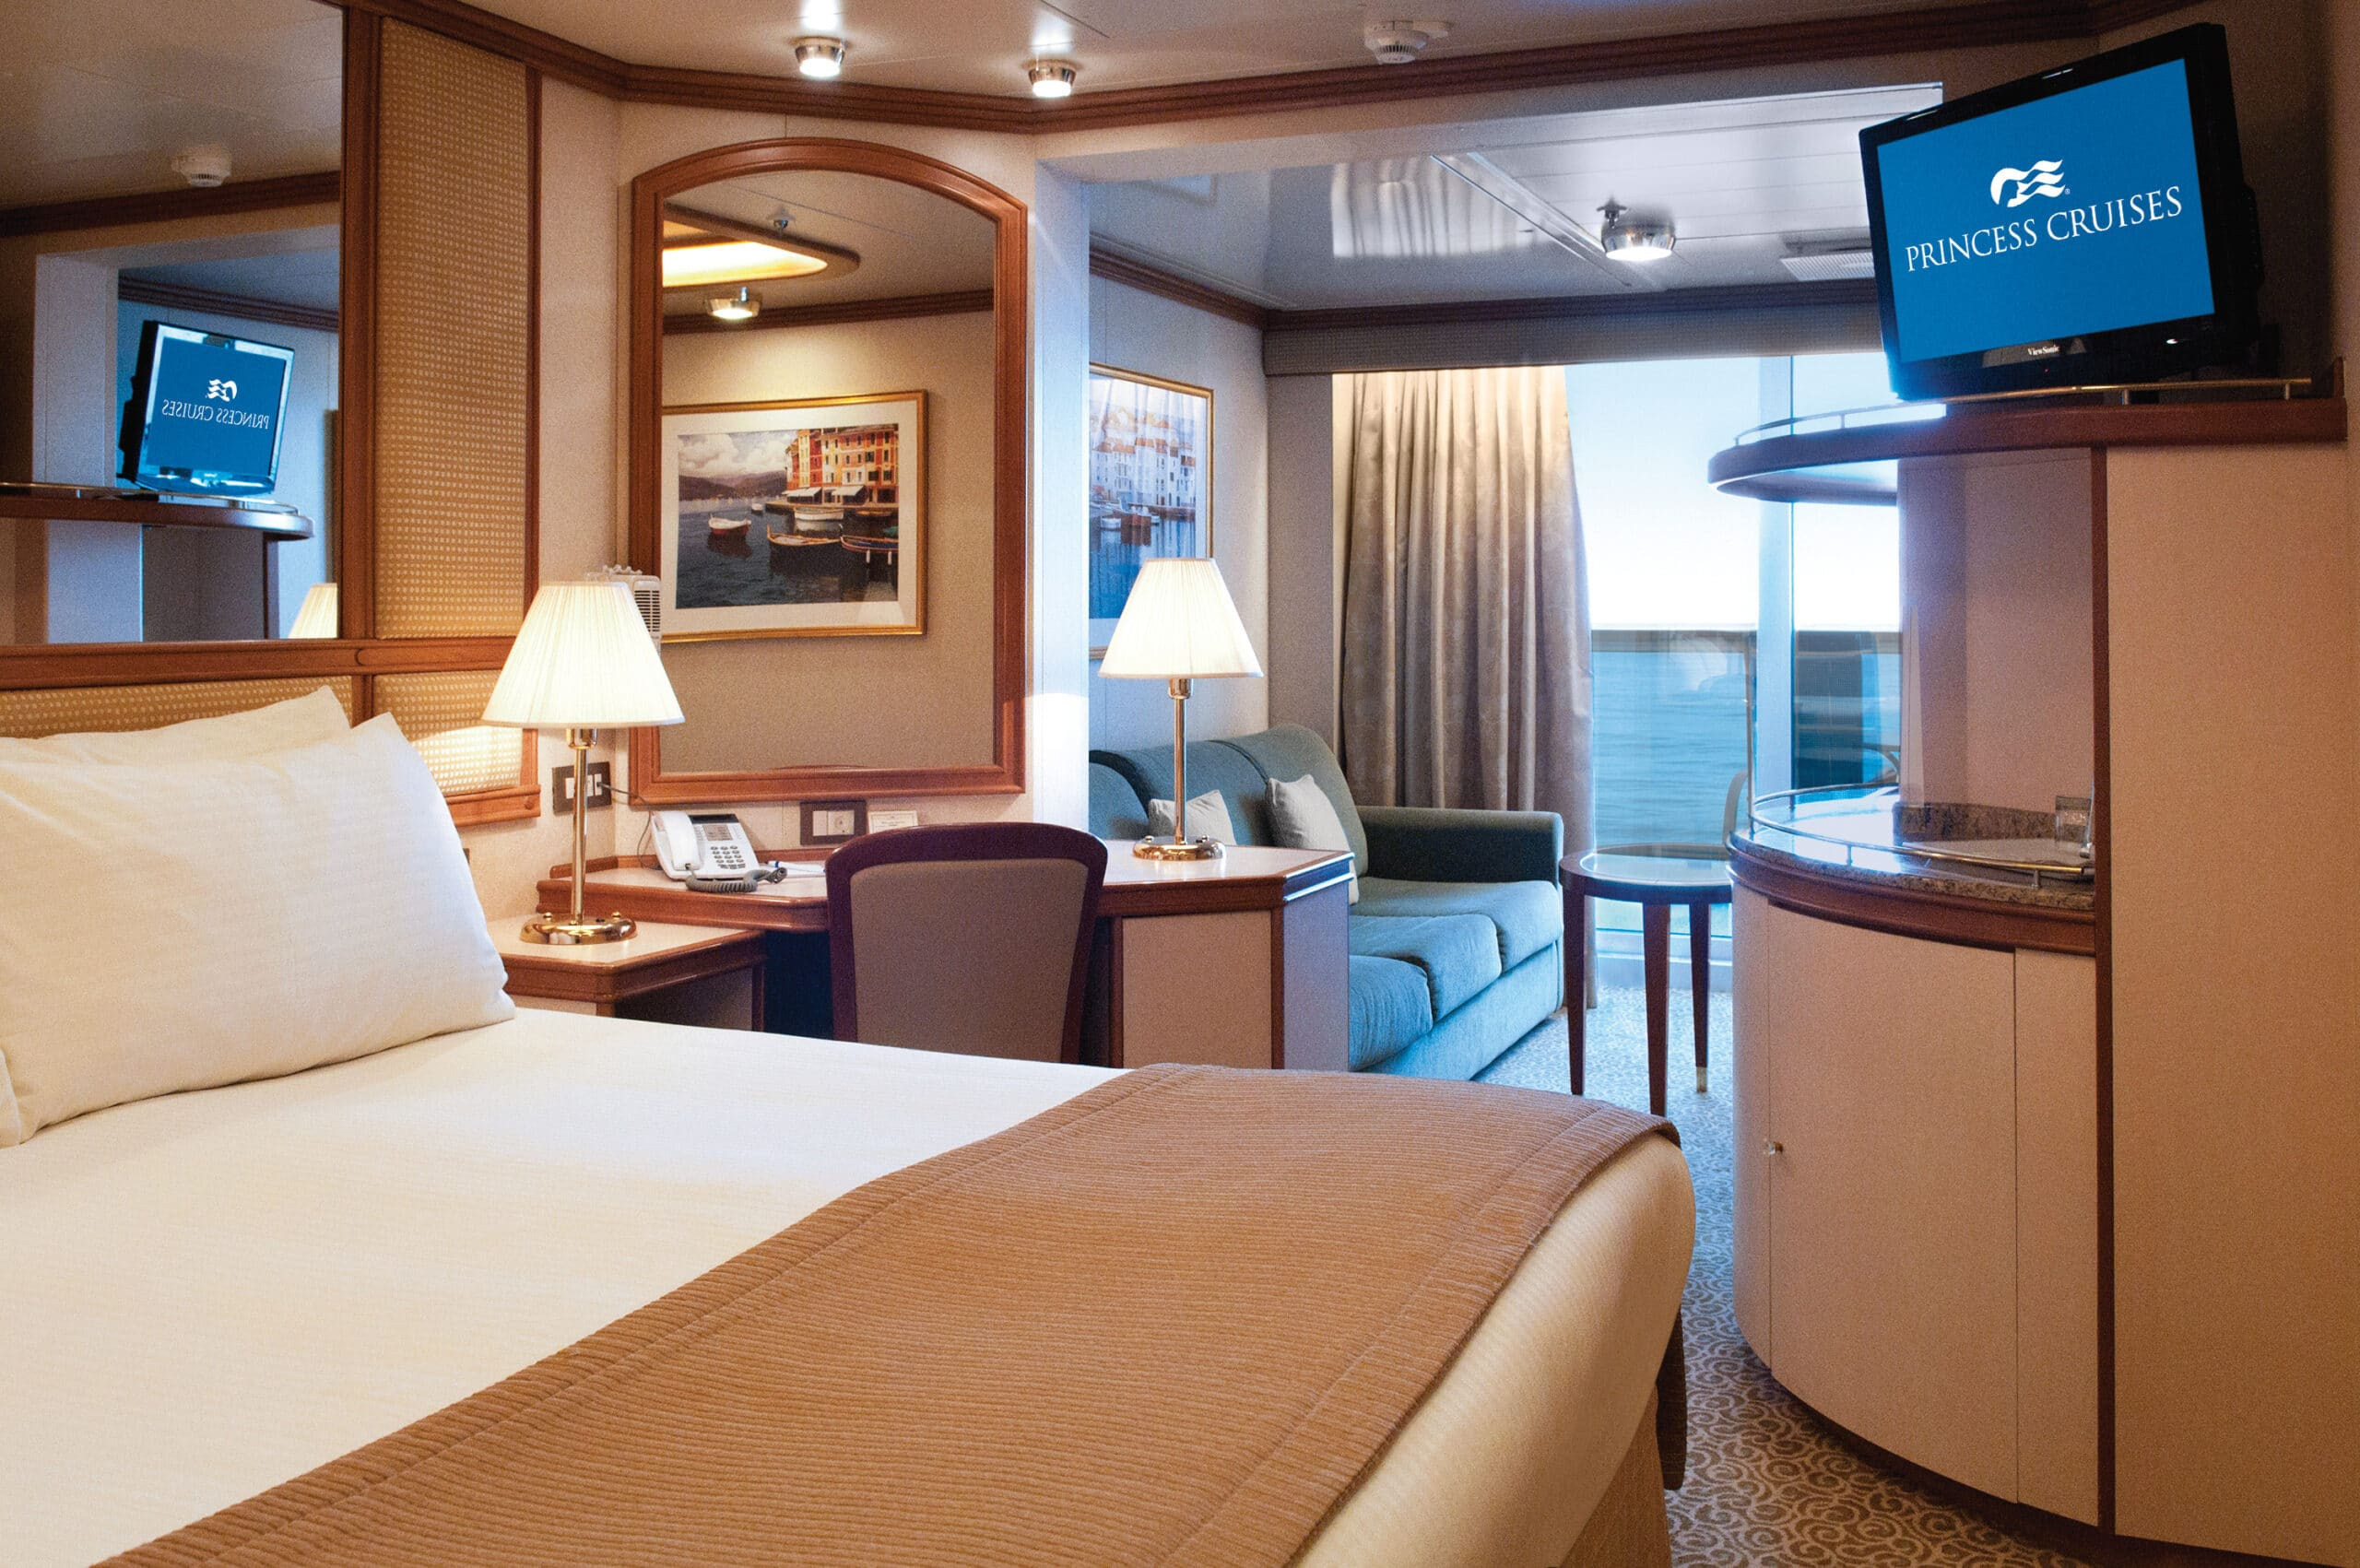 Princess-cruises-Crown-princess-schip-cruiseschip-categorie mb-md-me- minisuite met balkon